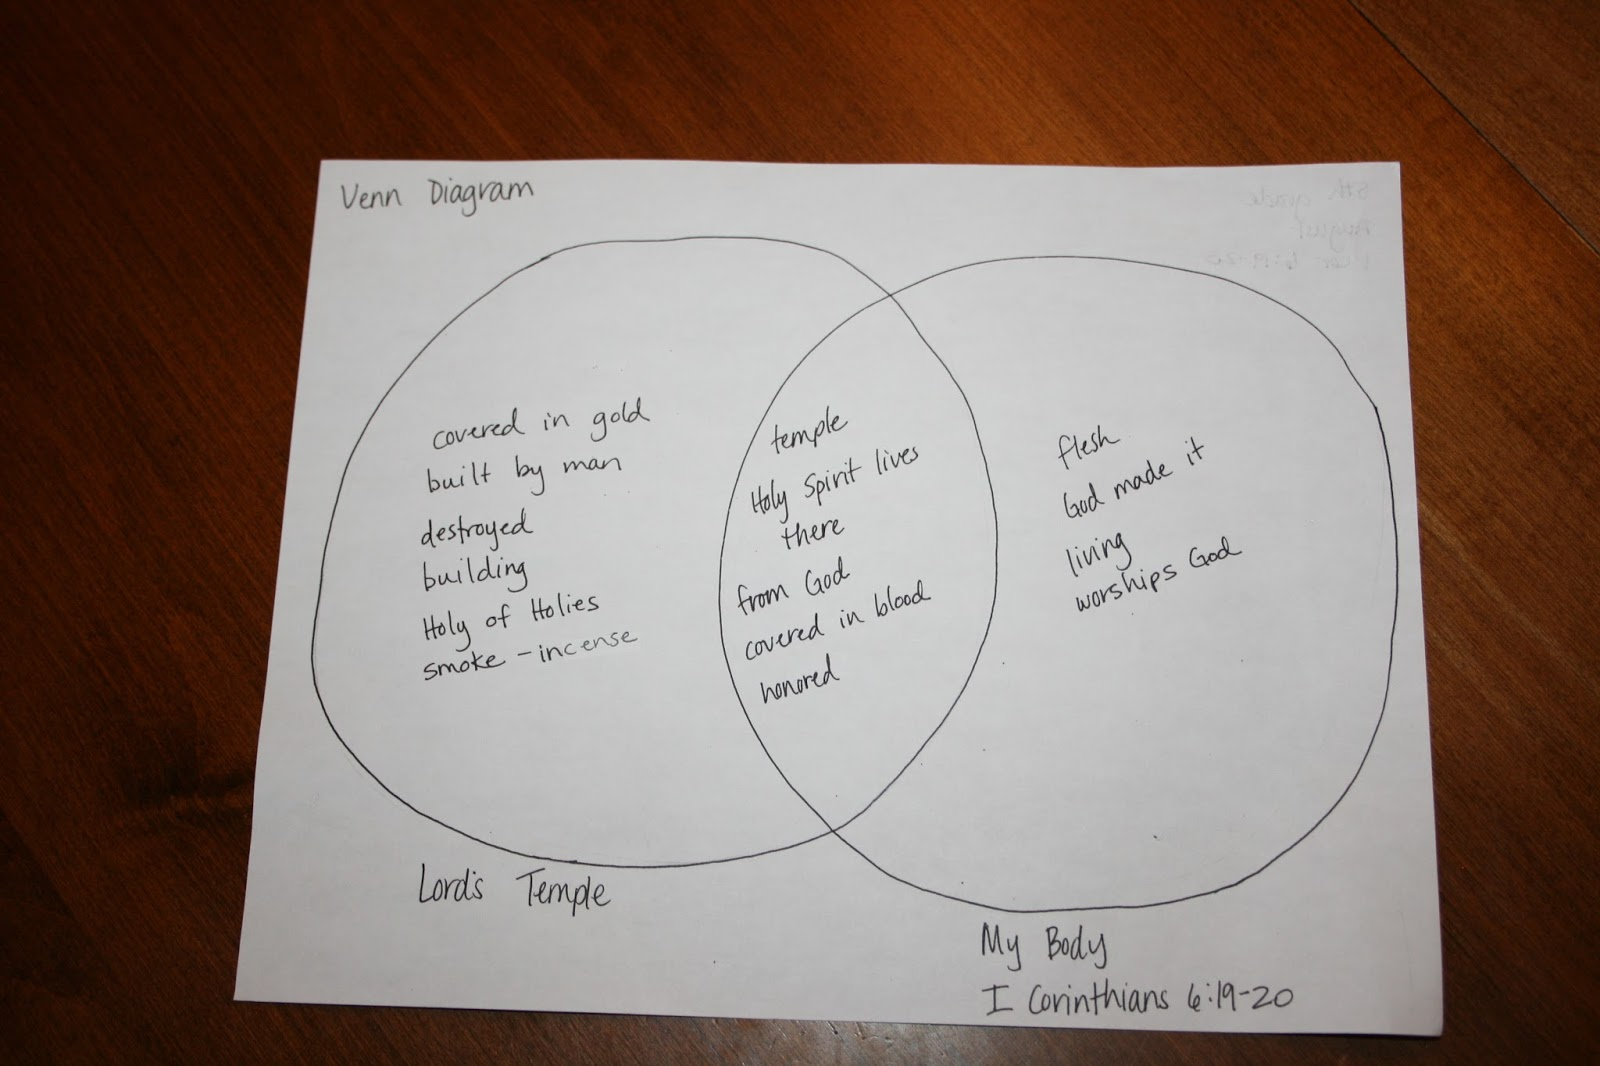 Teaching kids the bible 5th grade hide the word august 1 5th grade hide the word august 1 corinthians venn diagram pooptronica